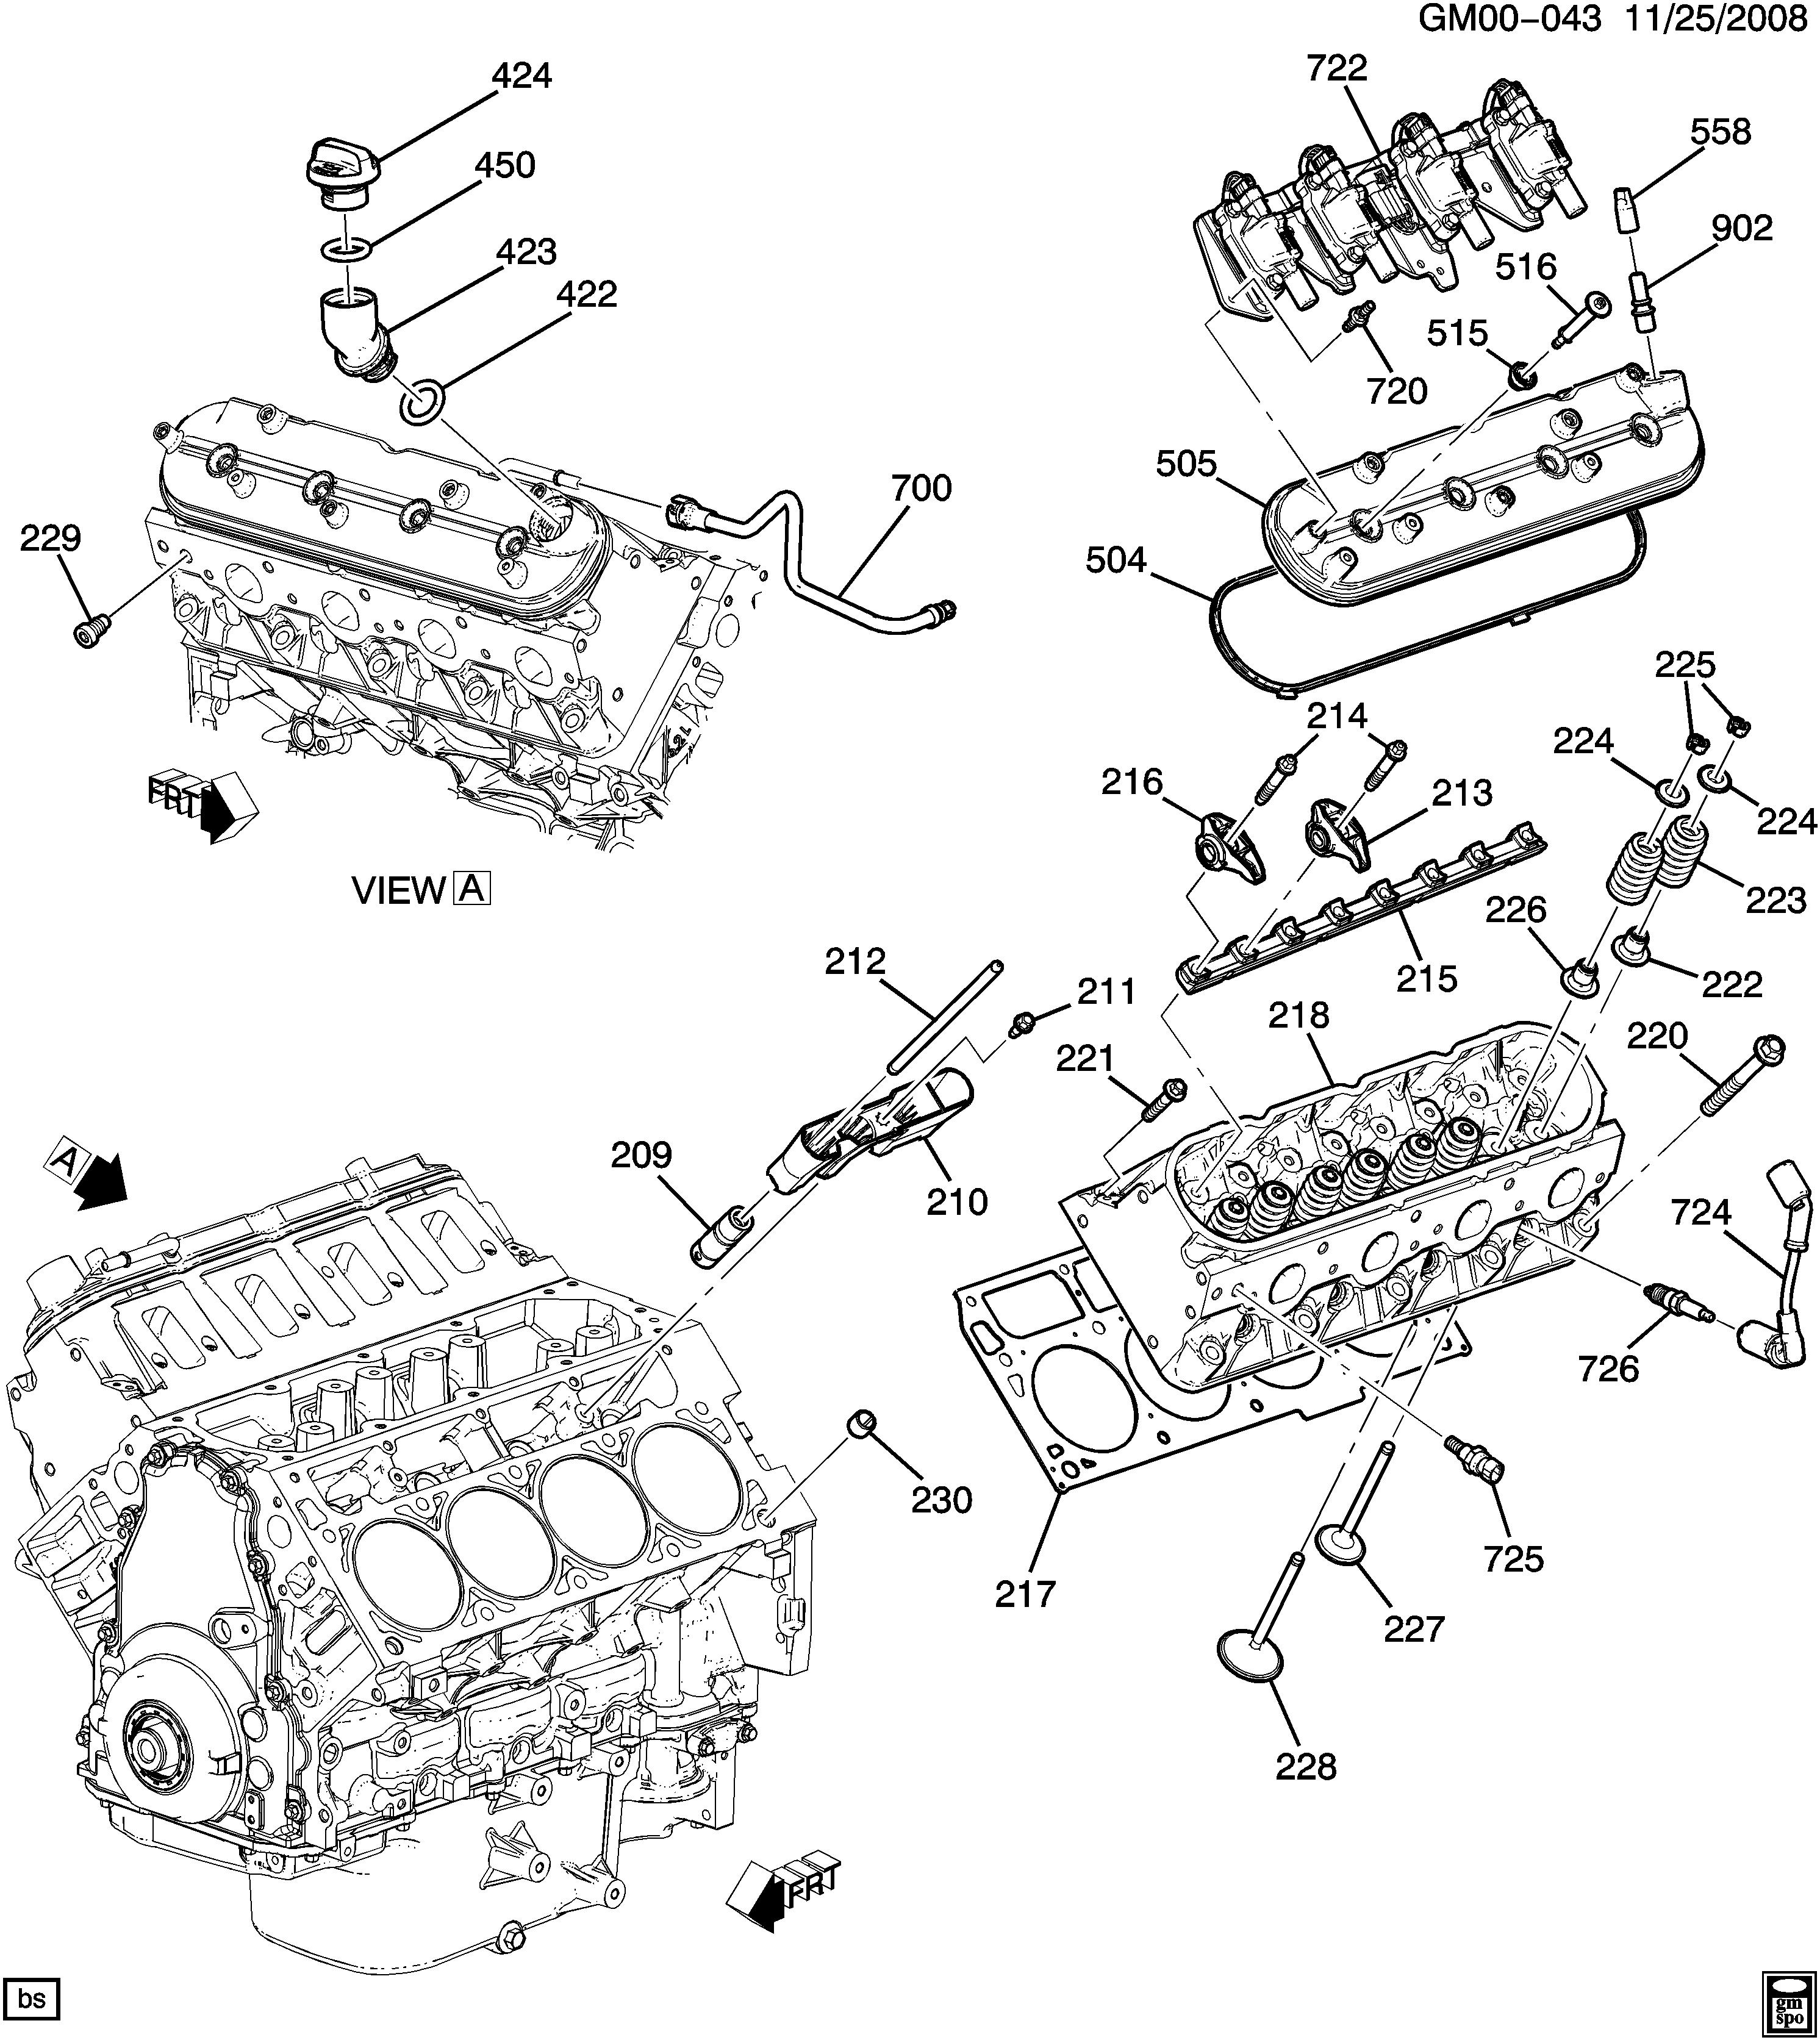 Camaro Convertible - Engine asm-6.2l v8 part 2 cylinder head & related parts  > Chevrolet EPC Online > Nemiga.com | Chevrolet L99 Engine Diagram |  | Parts catalogs